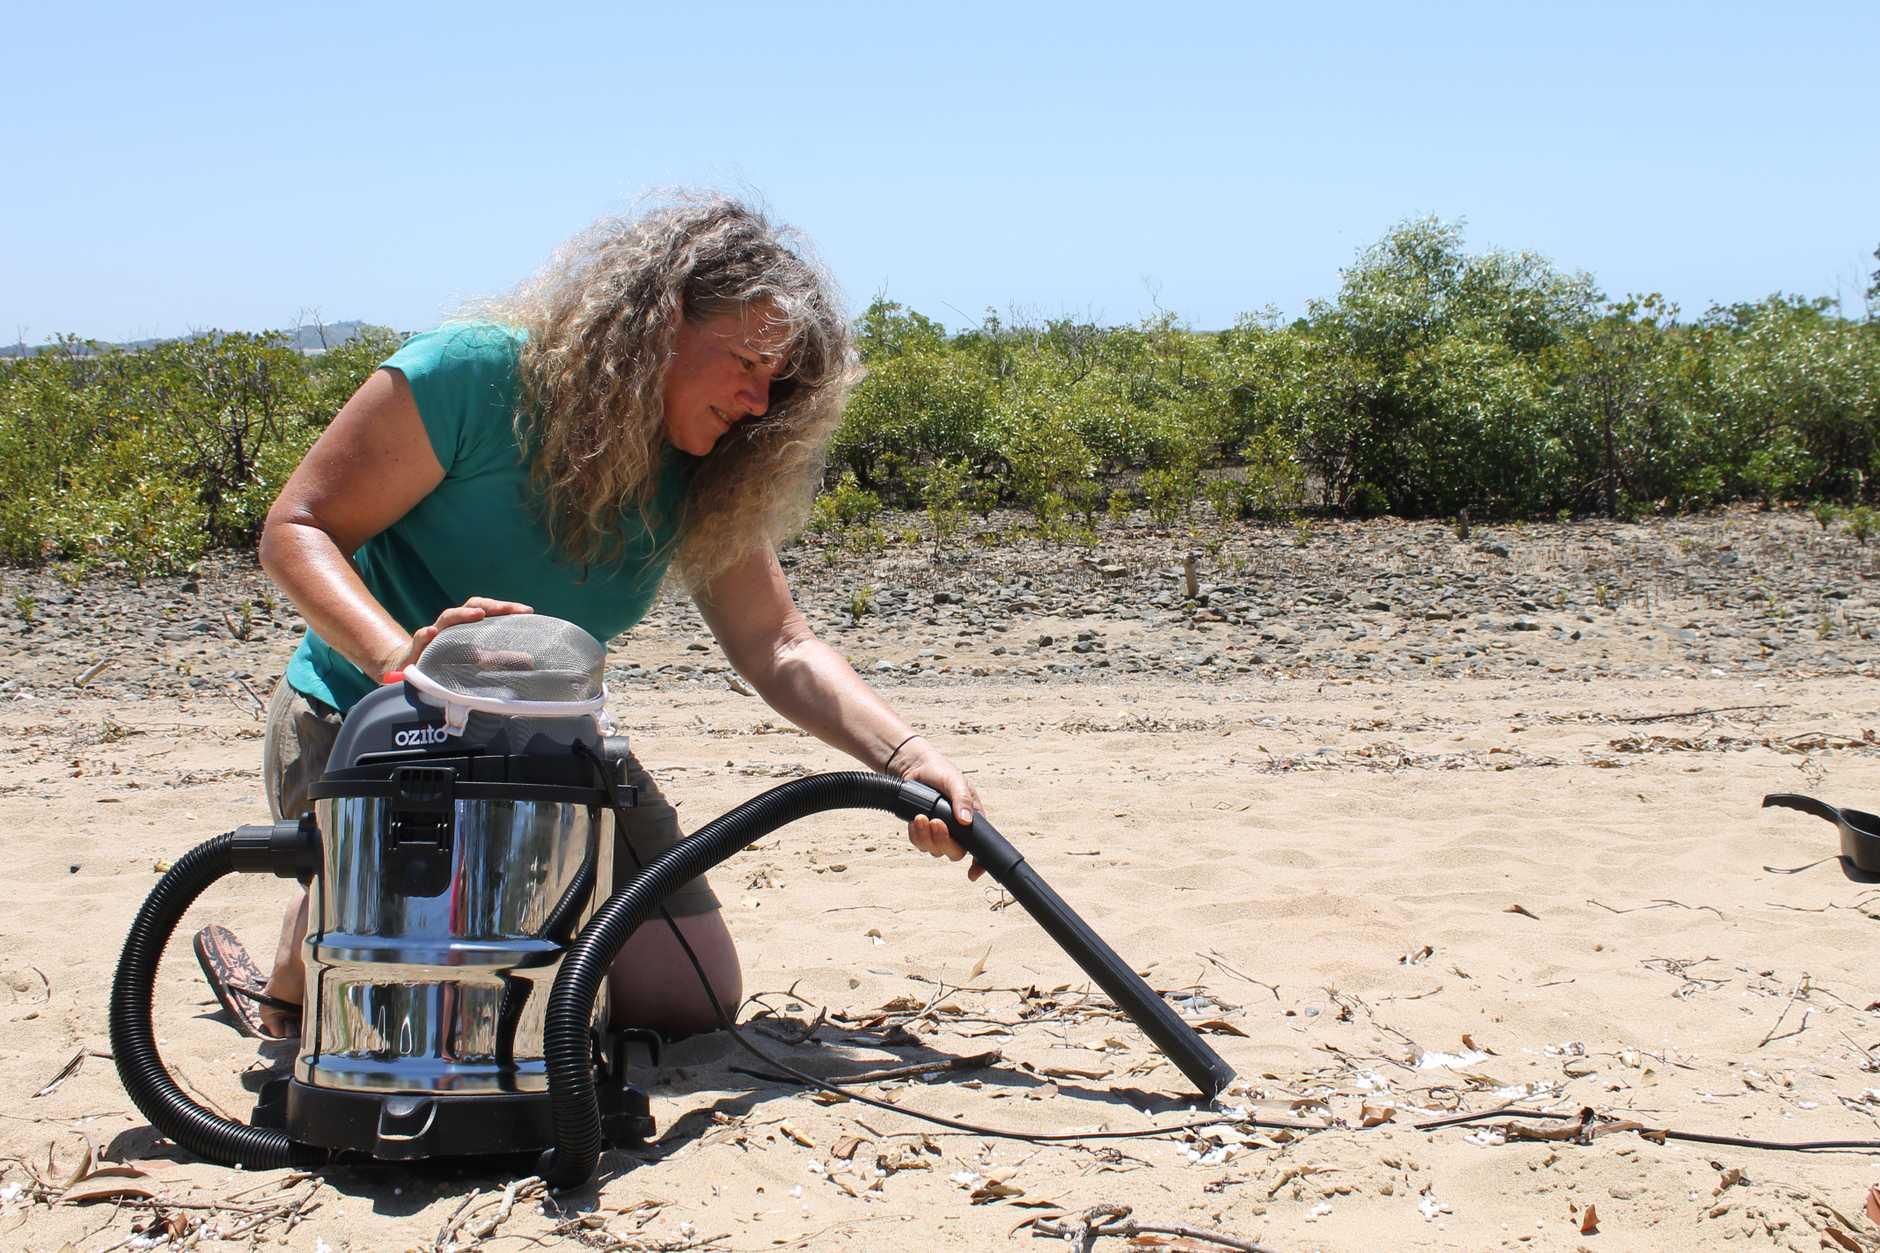 Paula Creen spent her weekend cleaning up styrofoam beanbag balls scattered along a Slade Point beach.